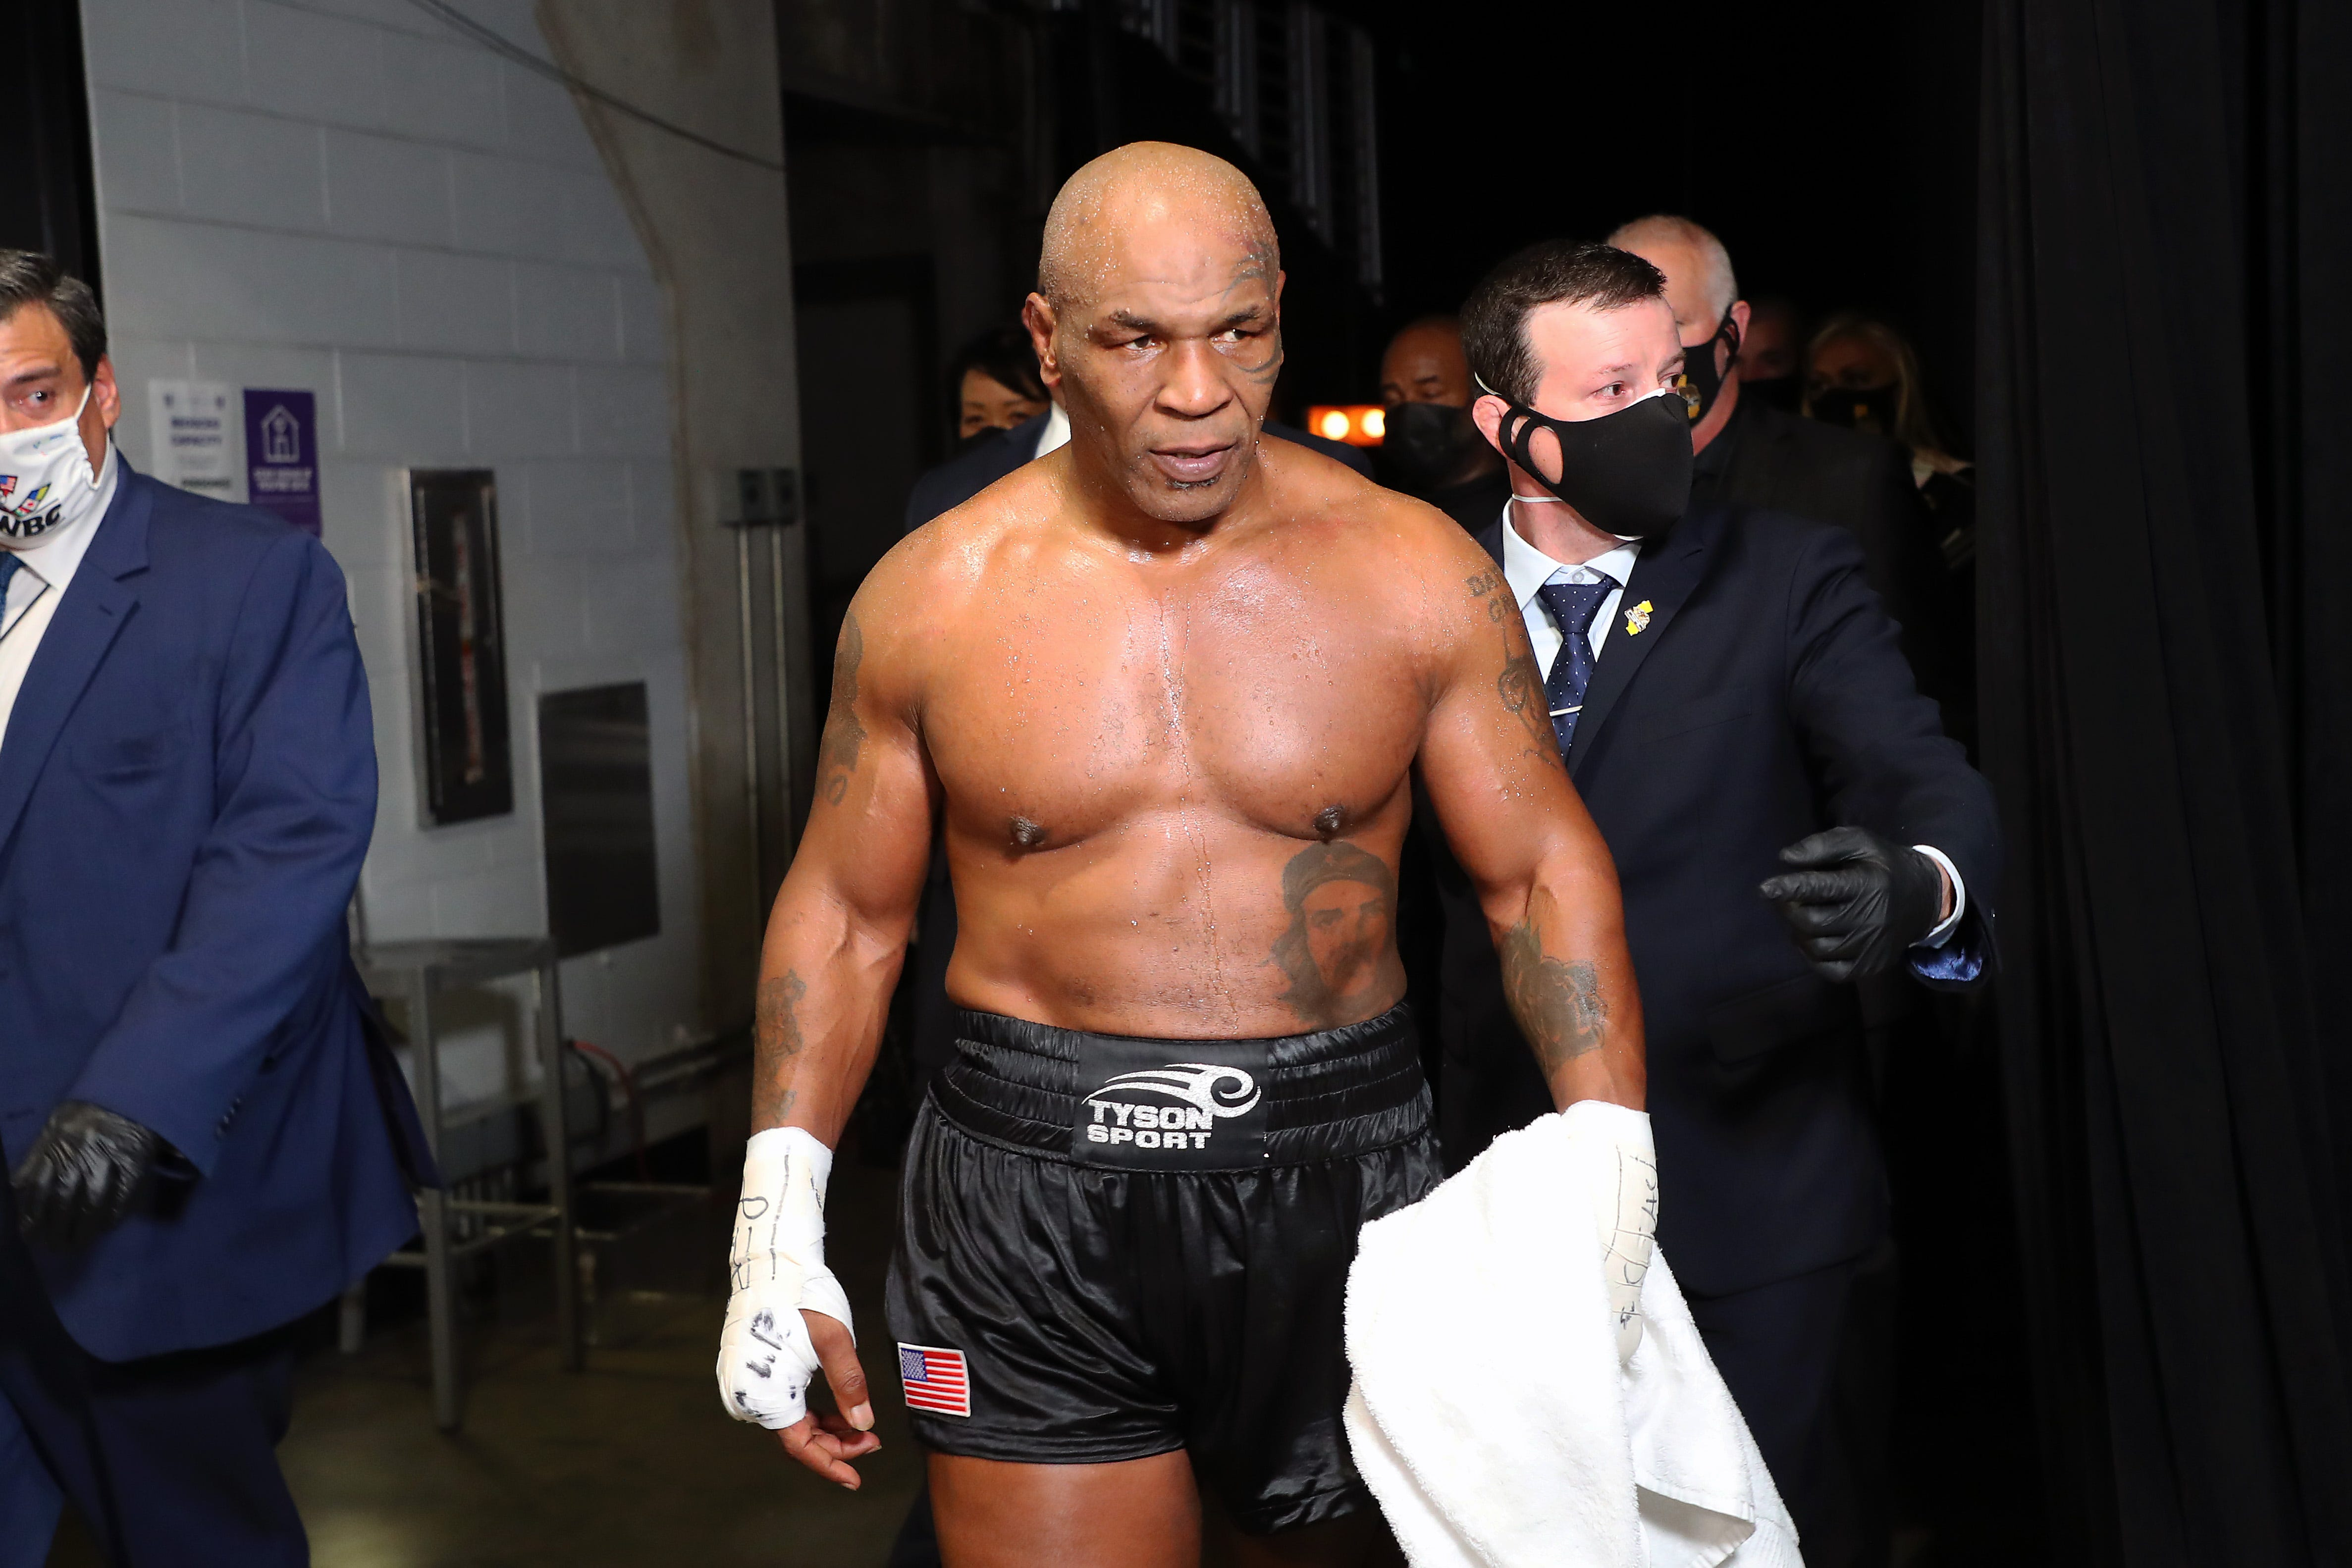 Mike Tyson says he smoked marijuana before fight vs. Roy Jones Jr.: 'It's just who I am'